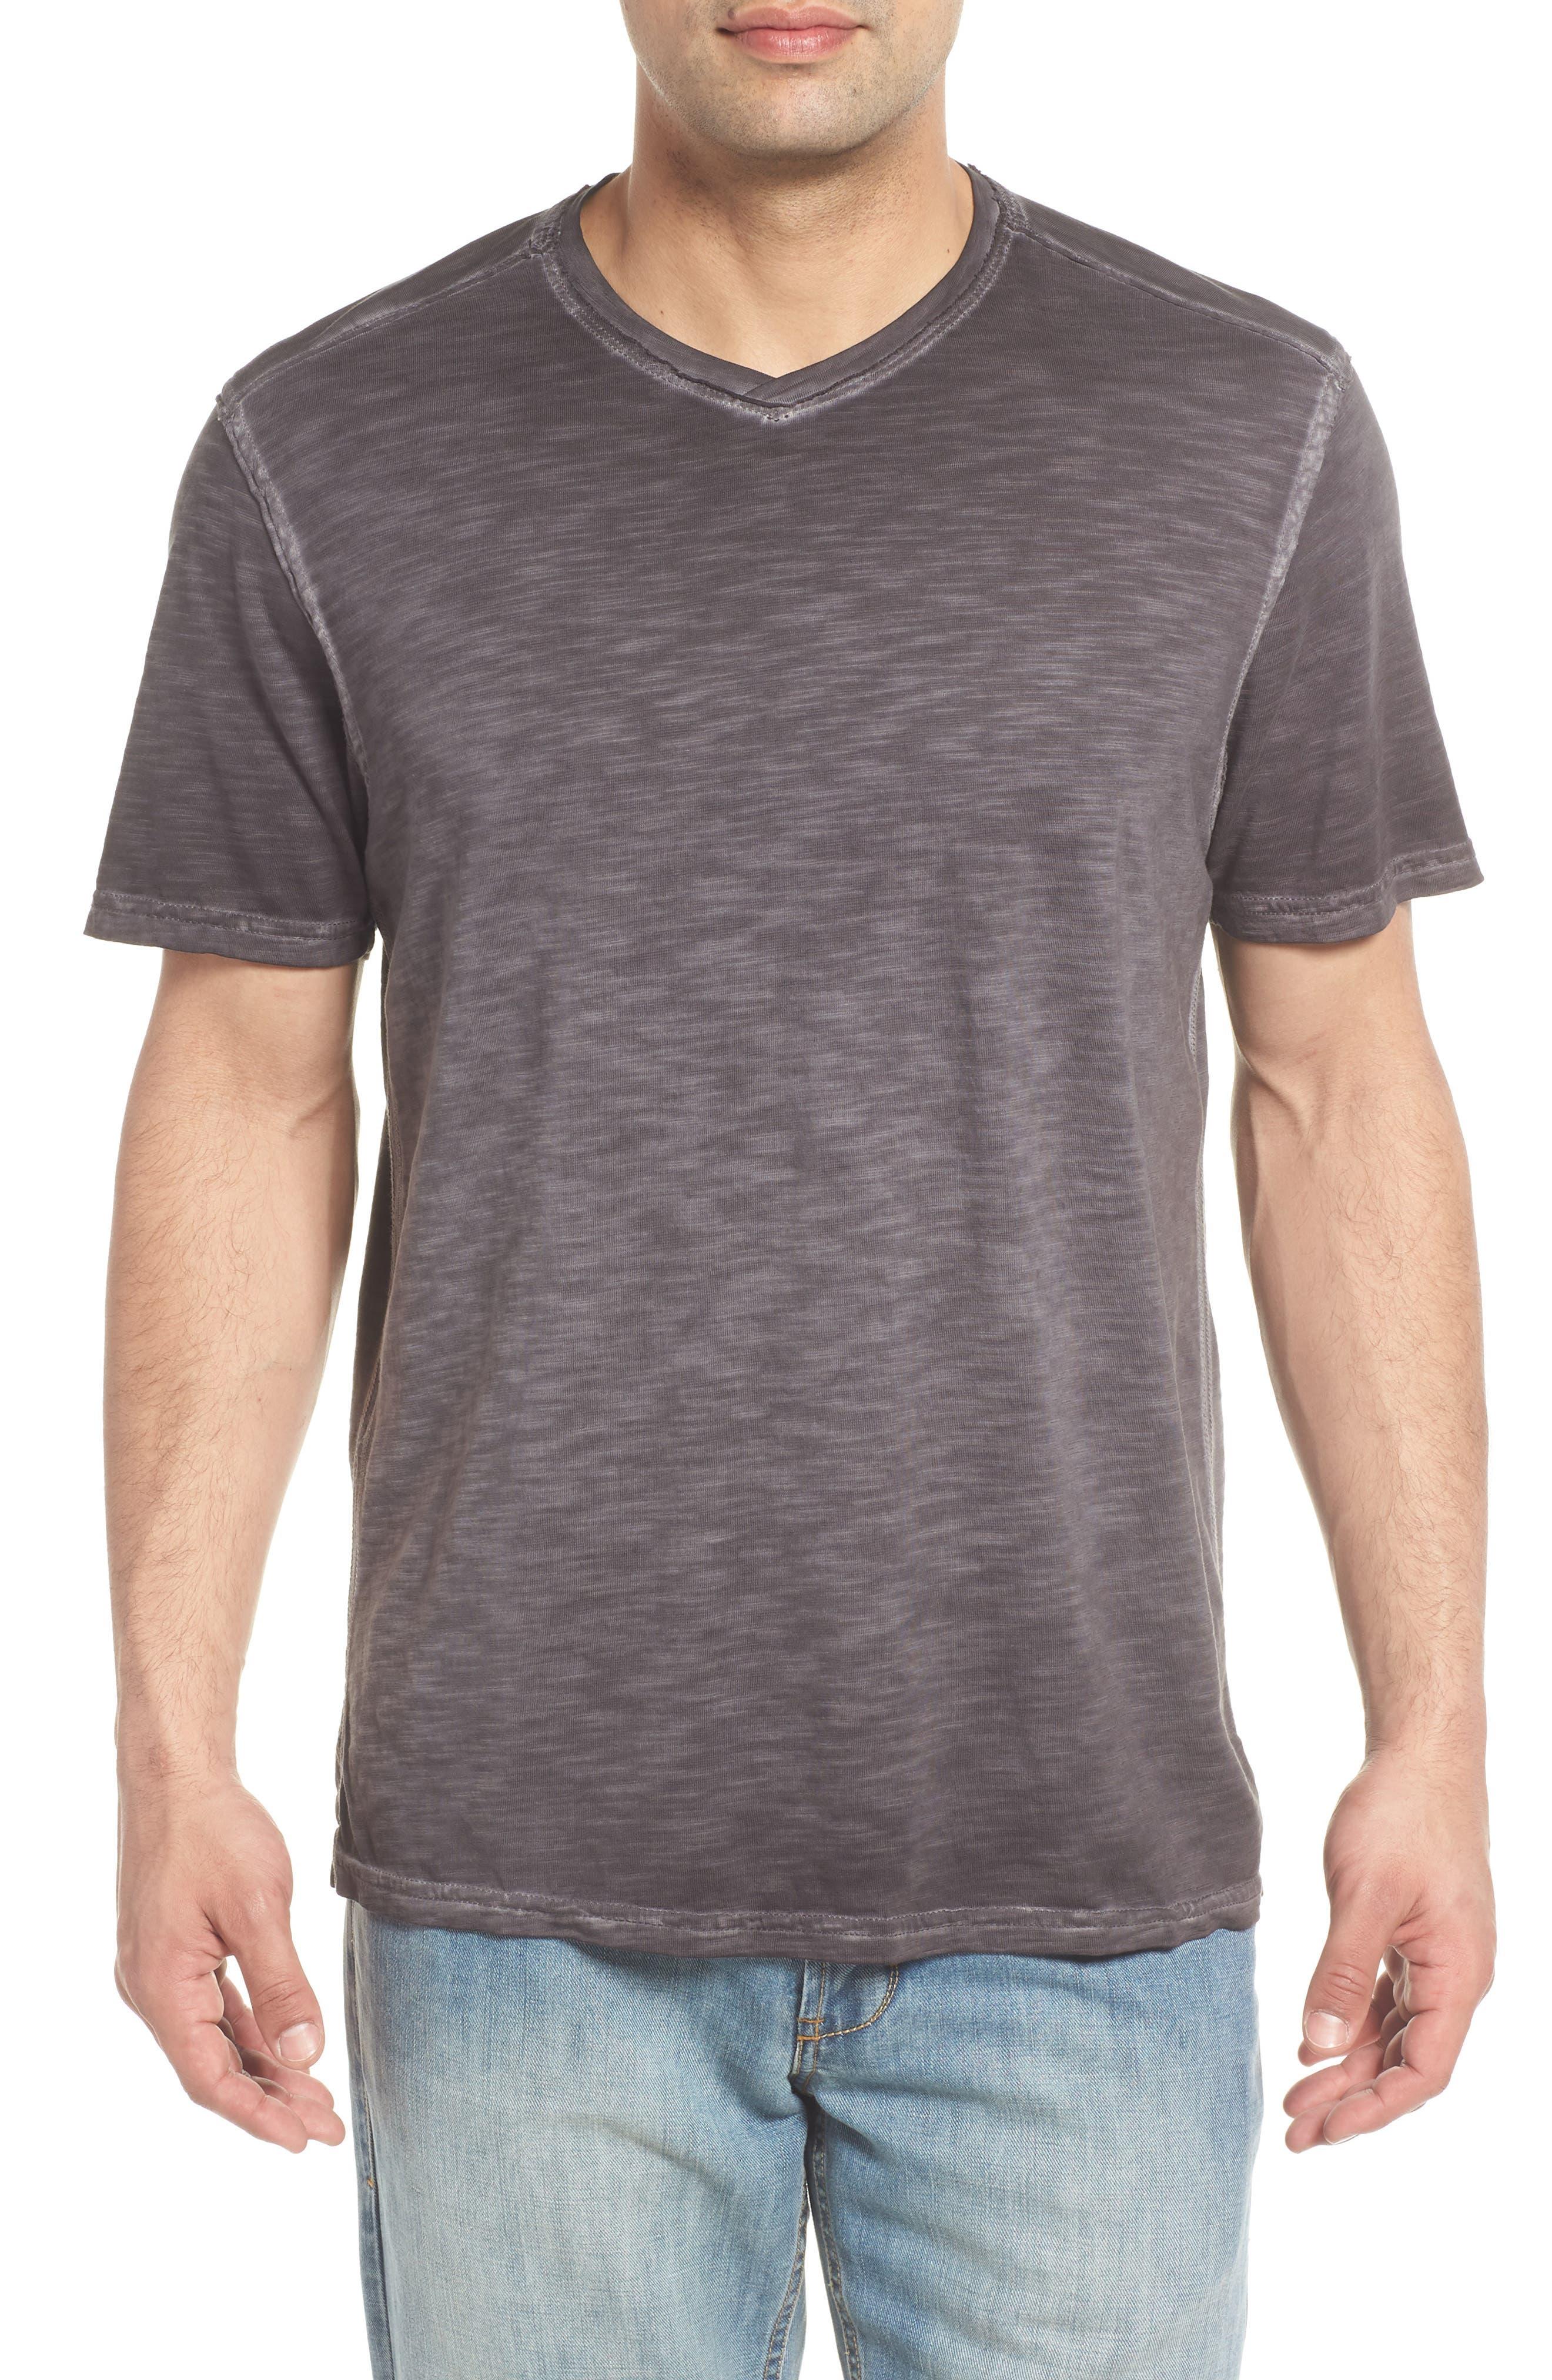 Suncoast Shores V-Neck T-Shirt,                             Main thumbnail 1, color,                             COAL